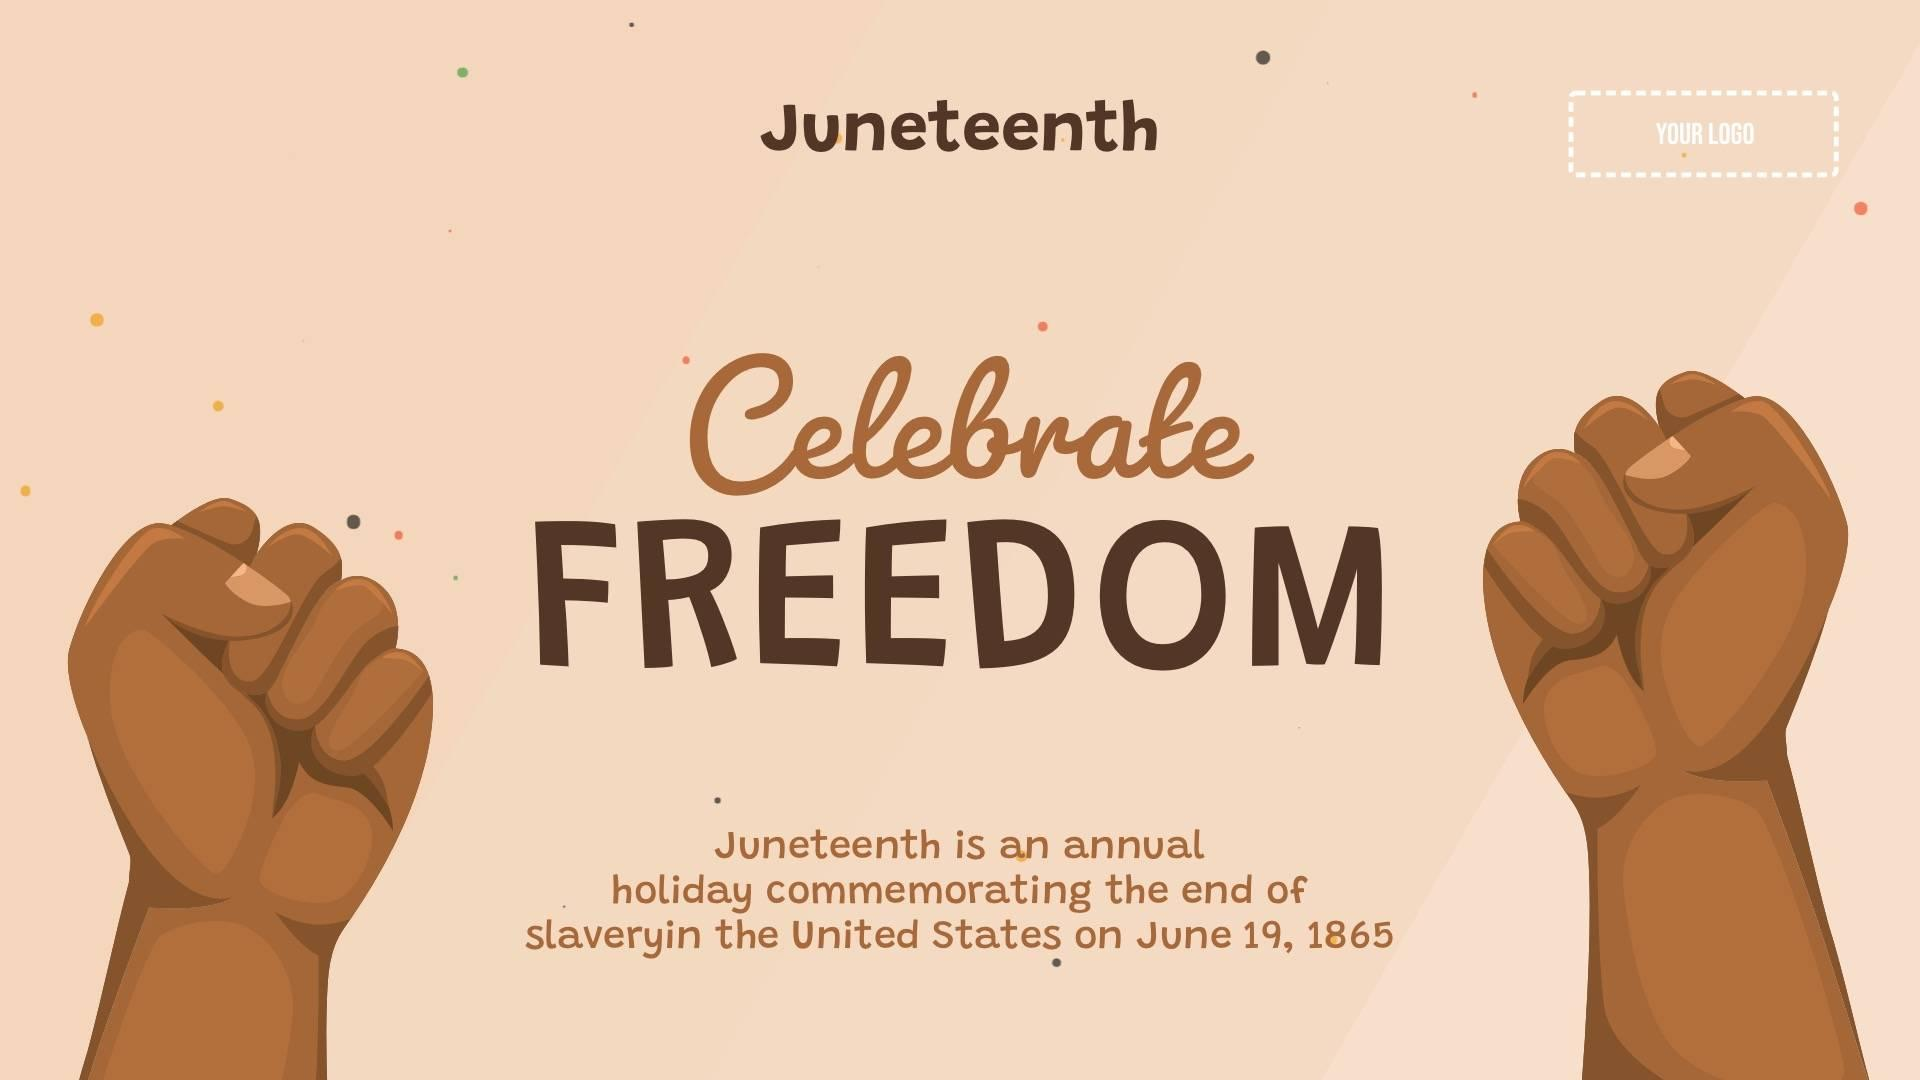 Juneteenth - Freedom Digital Signage Template